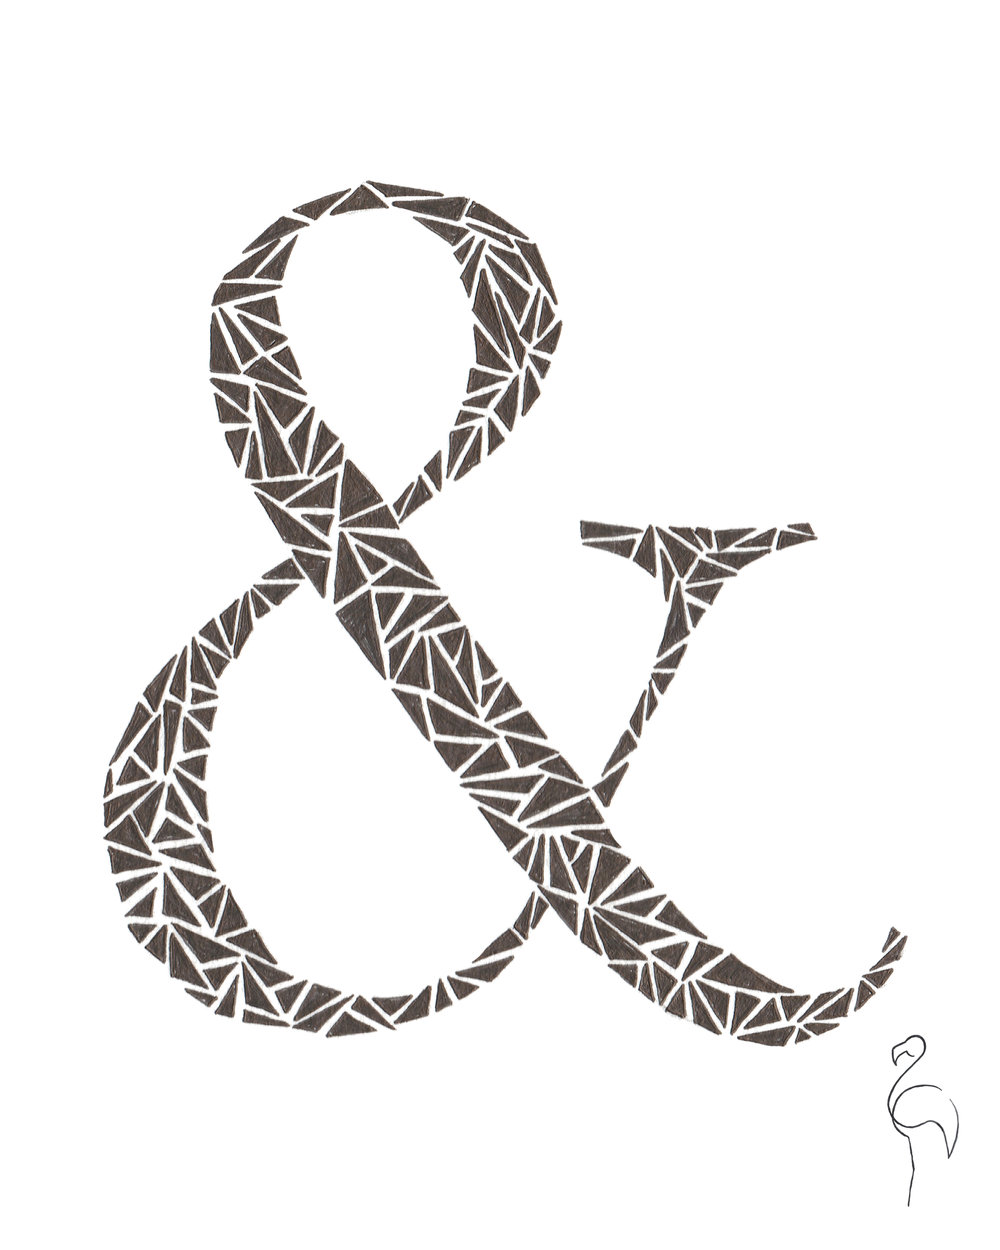 Brazzlebird - Ampersand Drawing Shatter Triangles.jpg